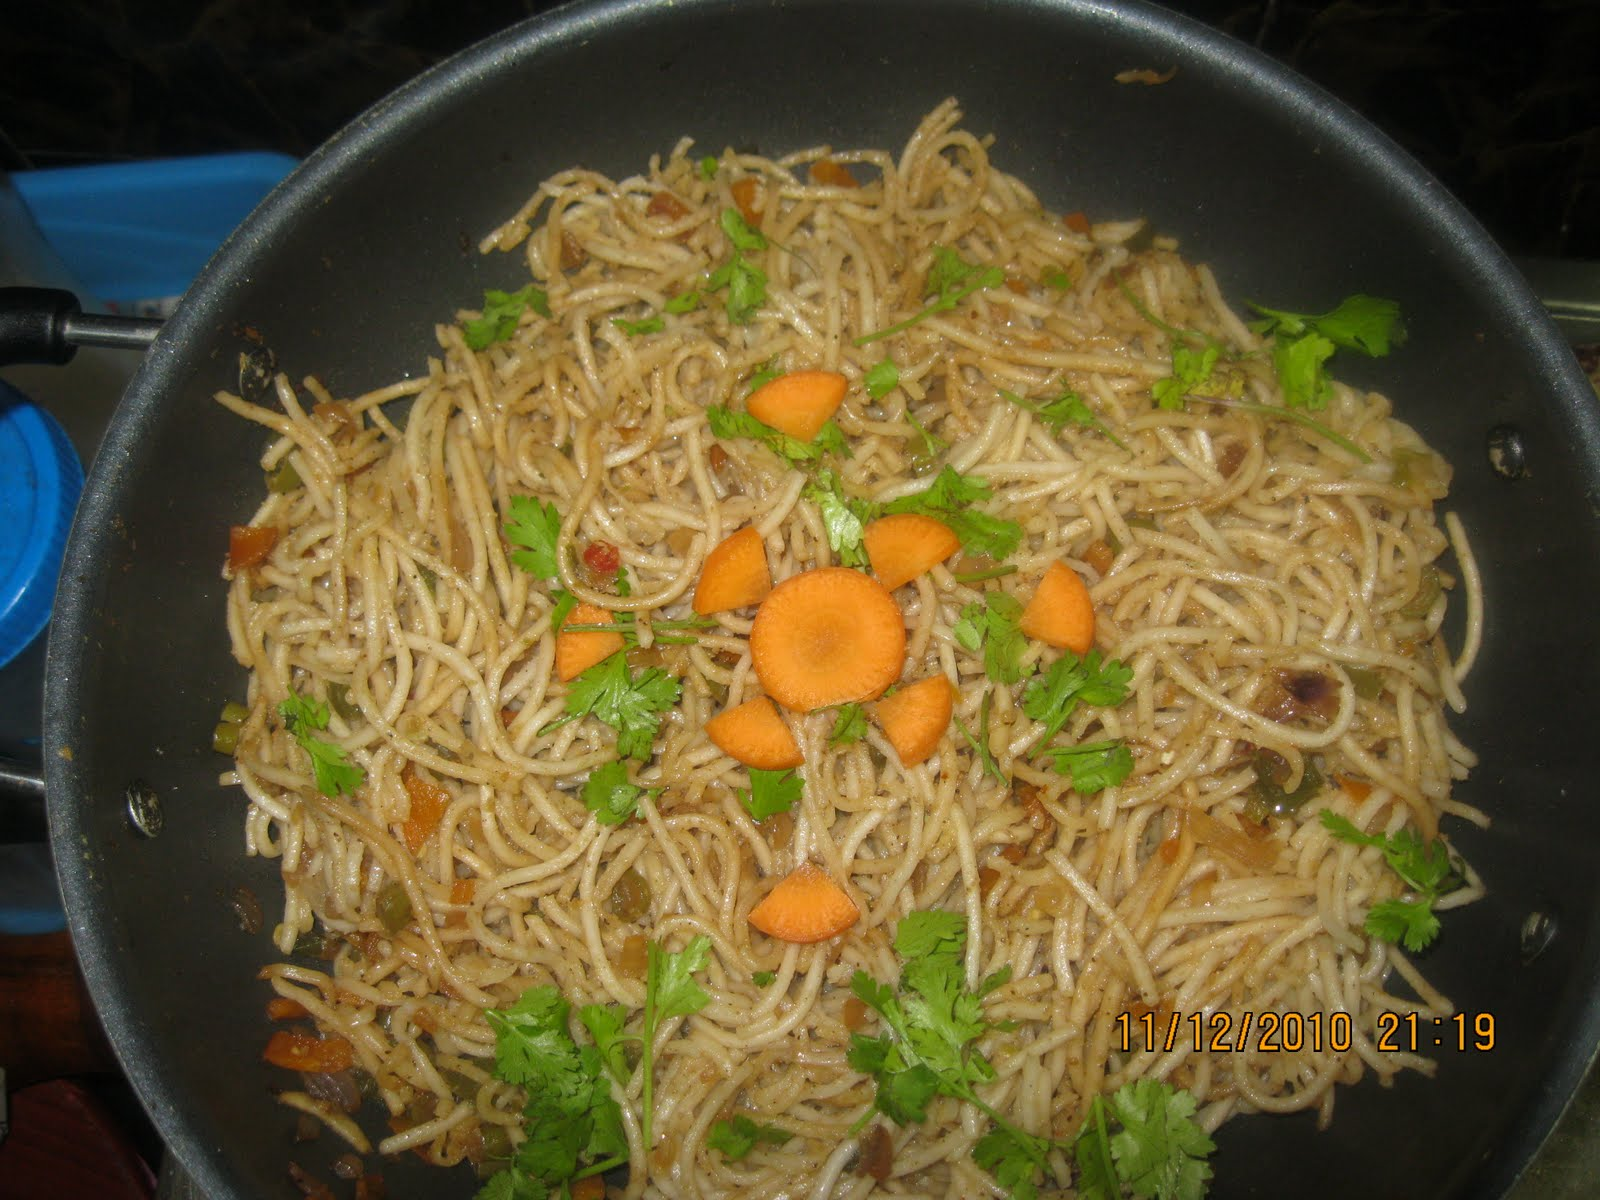 Jaraika Food Feast: Spicy Chinese Veg Noodles